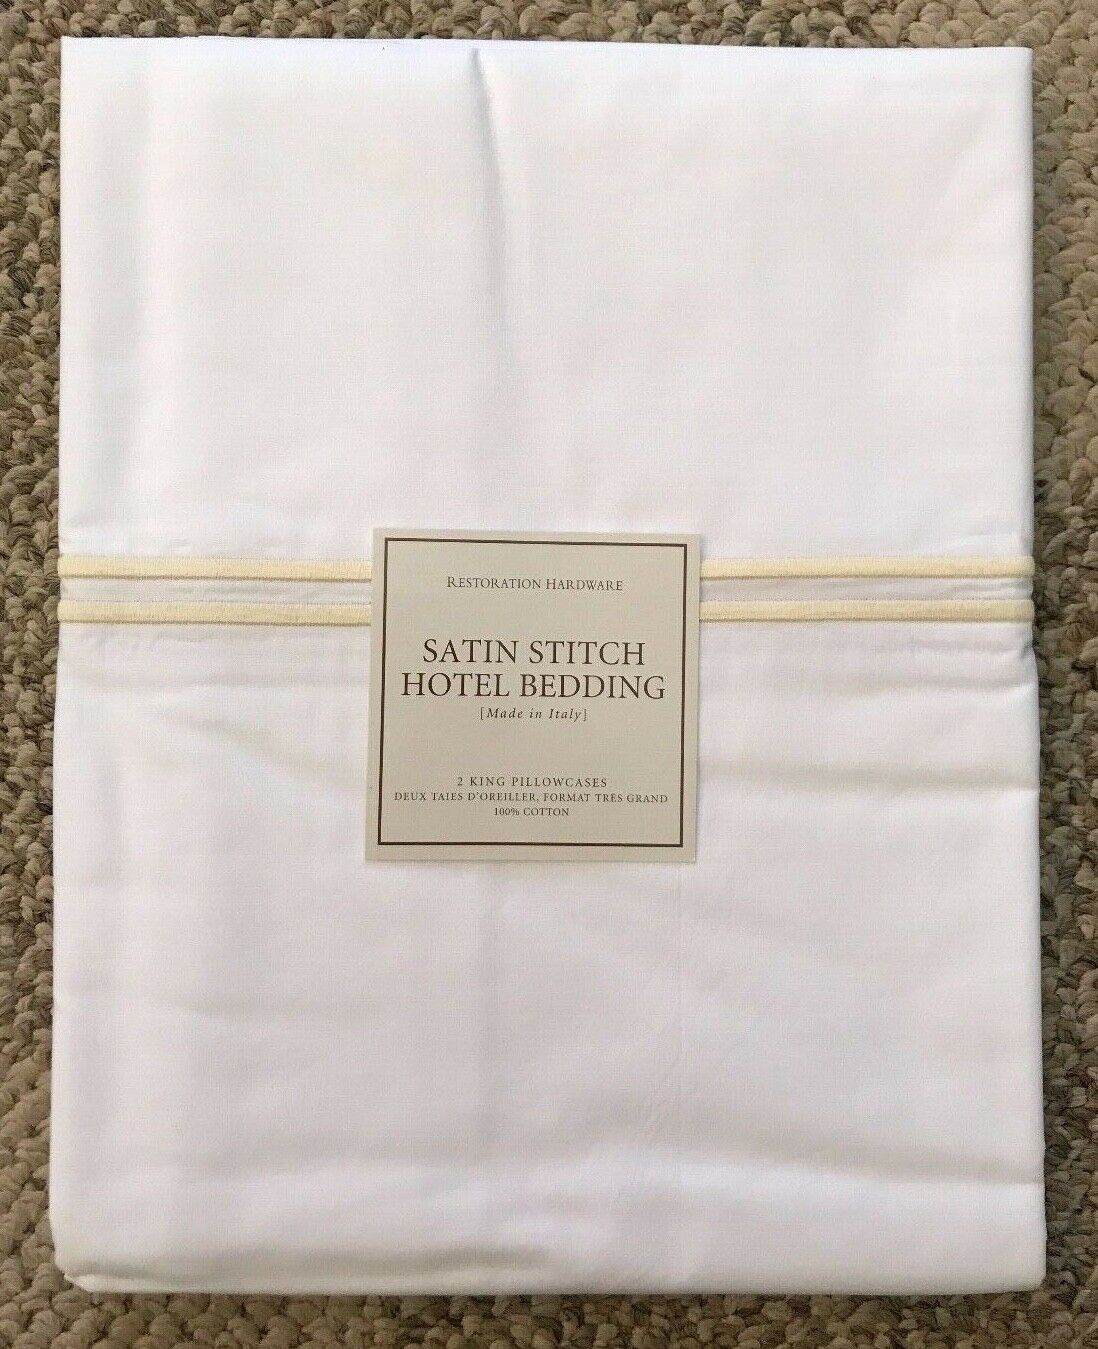 Restoration Hardware RH Satin Stitch Hotel 2 King Pillowcases White Butter